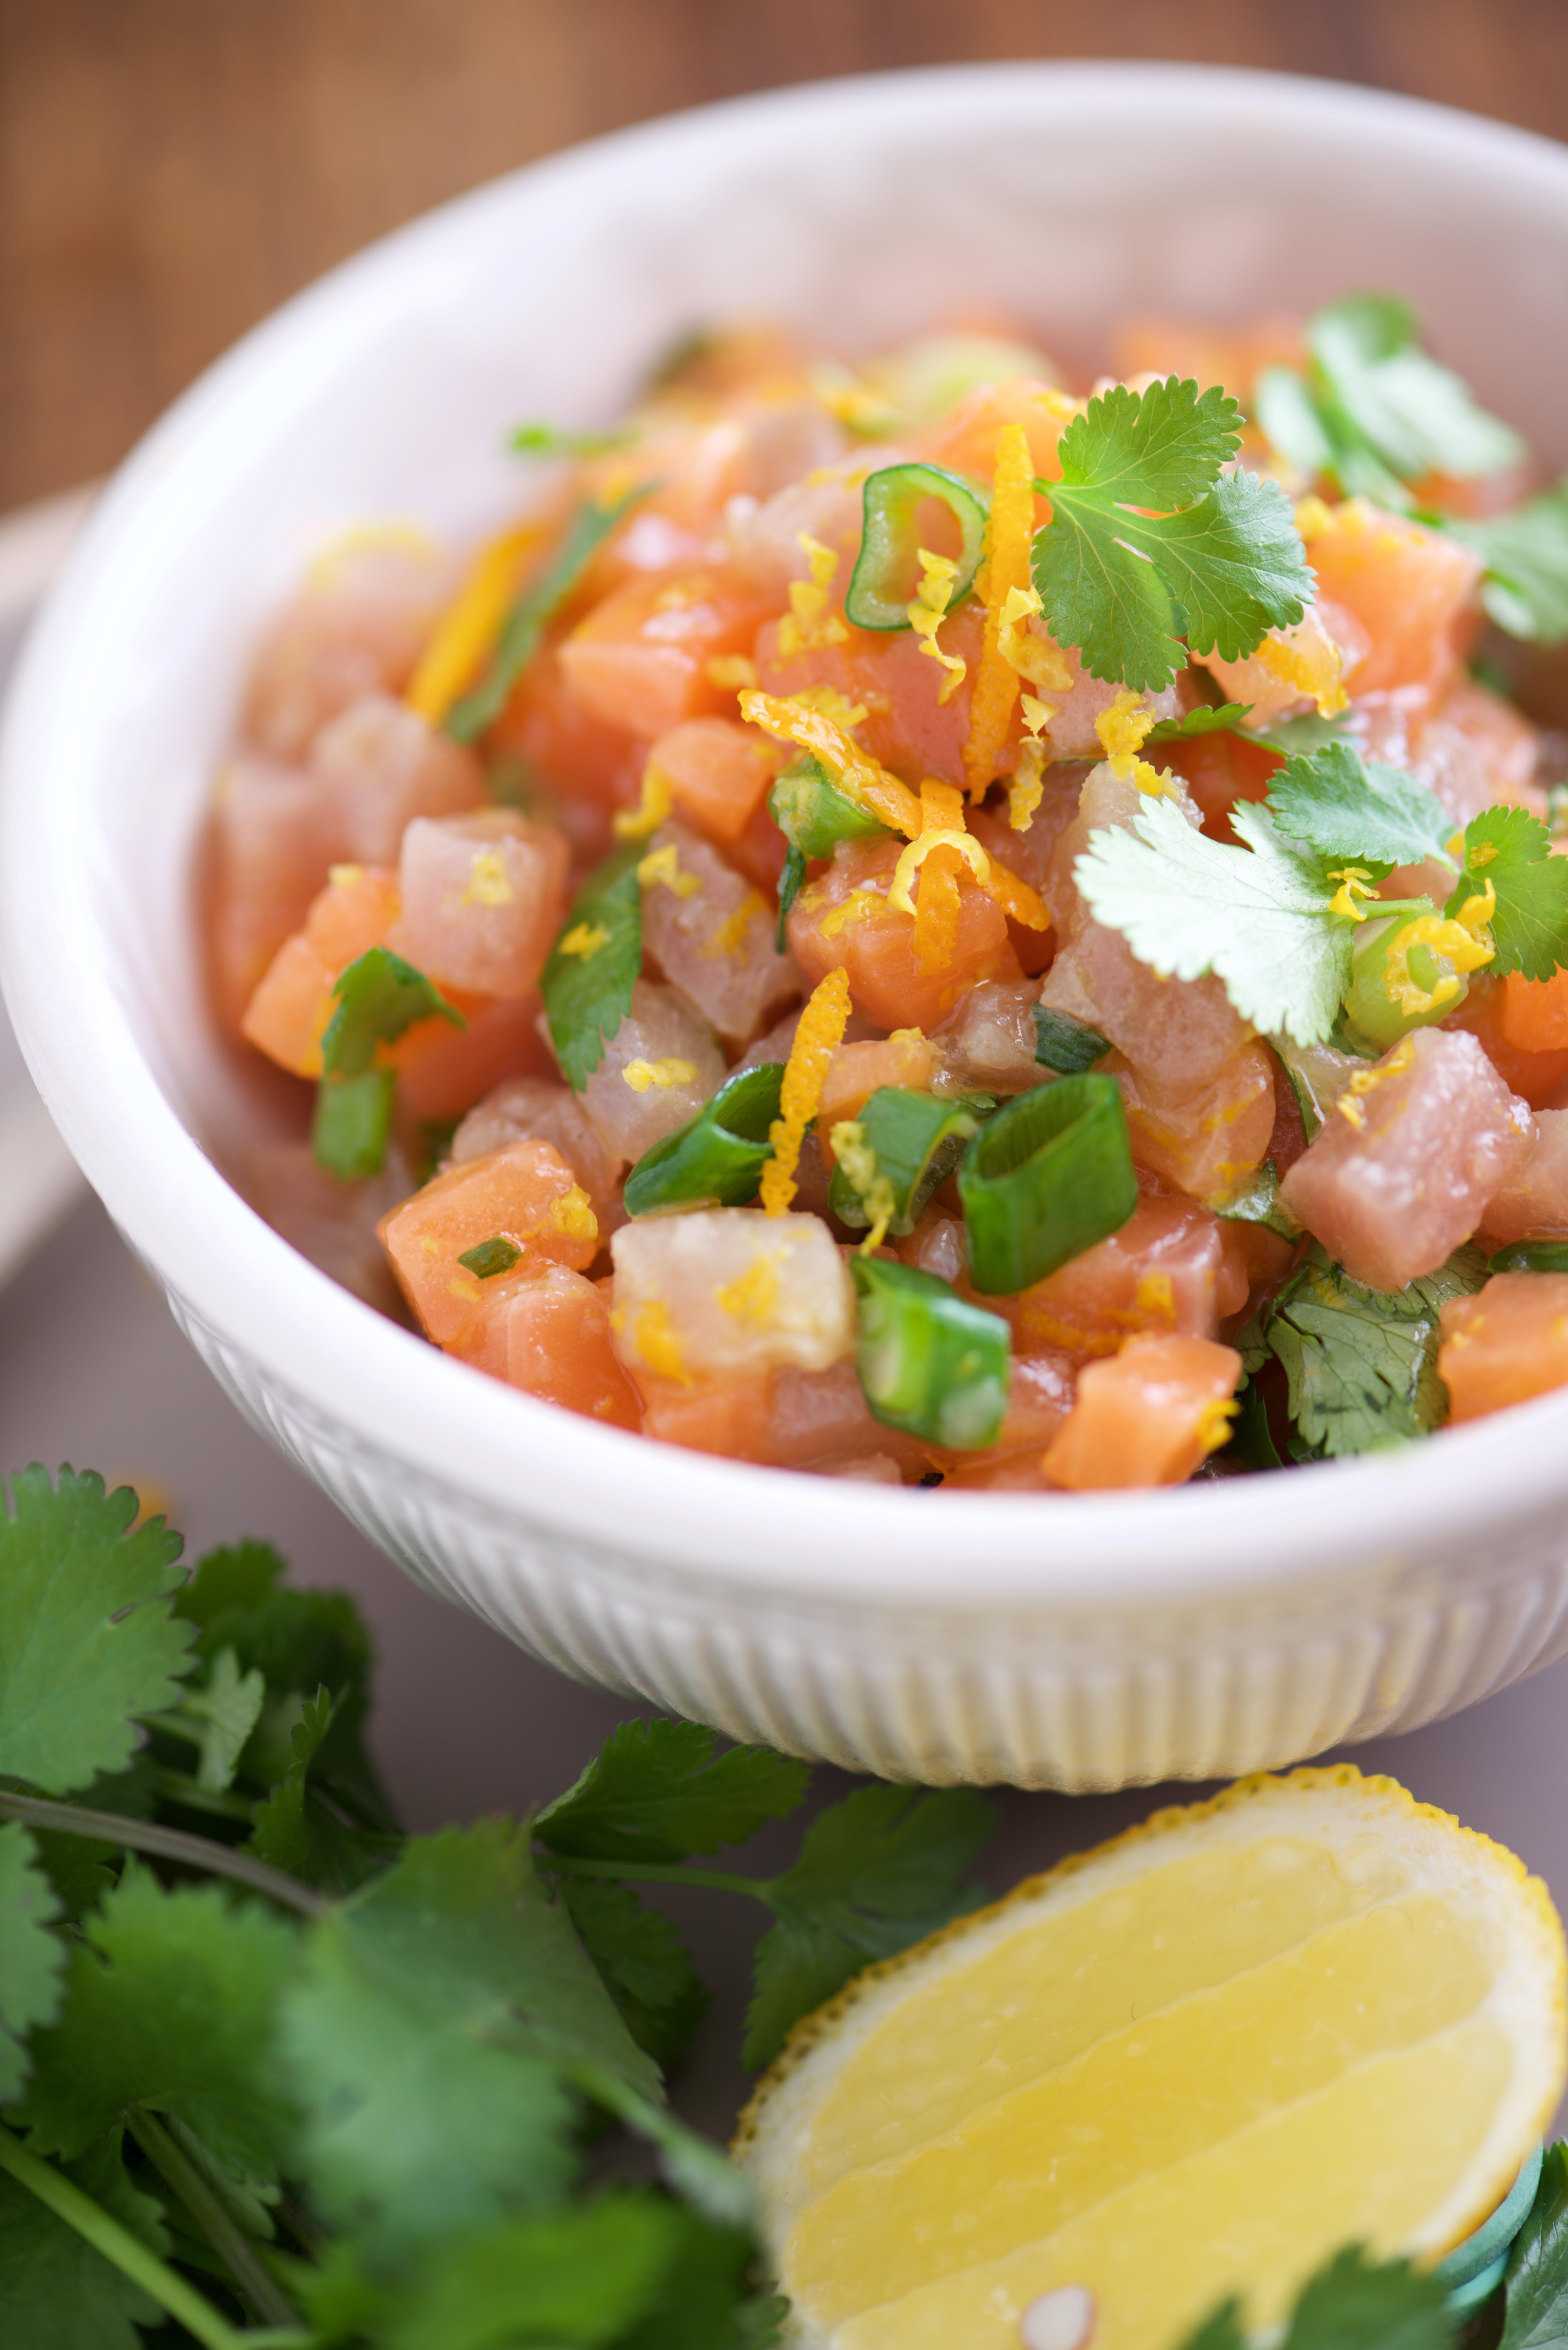 photographie culinaire de tartare de saumon